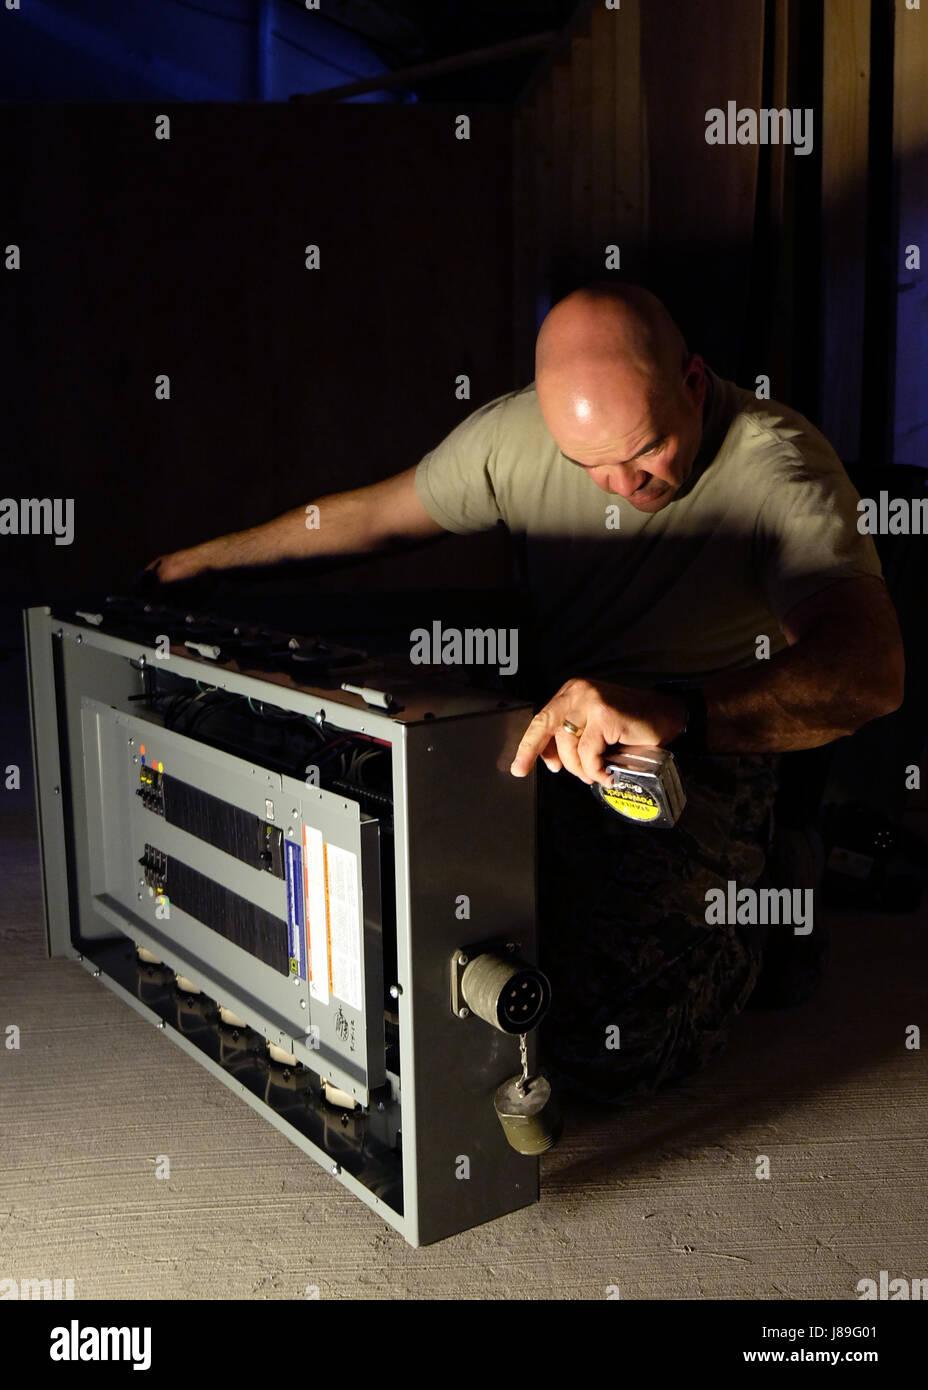 Circuit Breaker Box Stockfotos & Circuit Breaker Box Bilder - Alamy